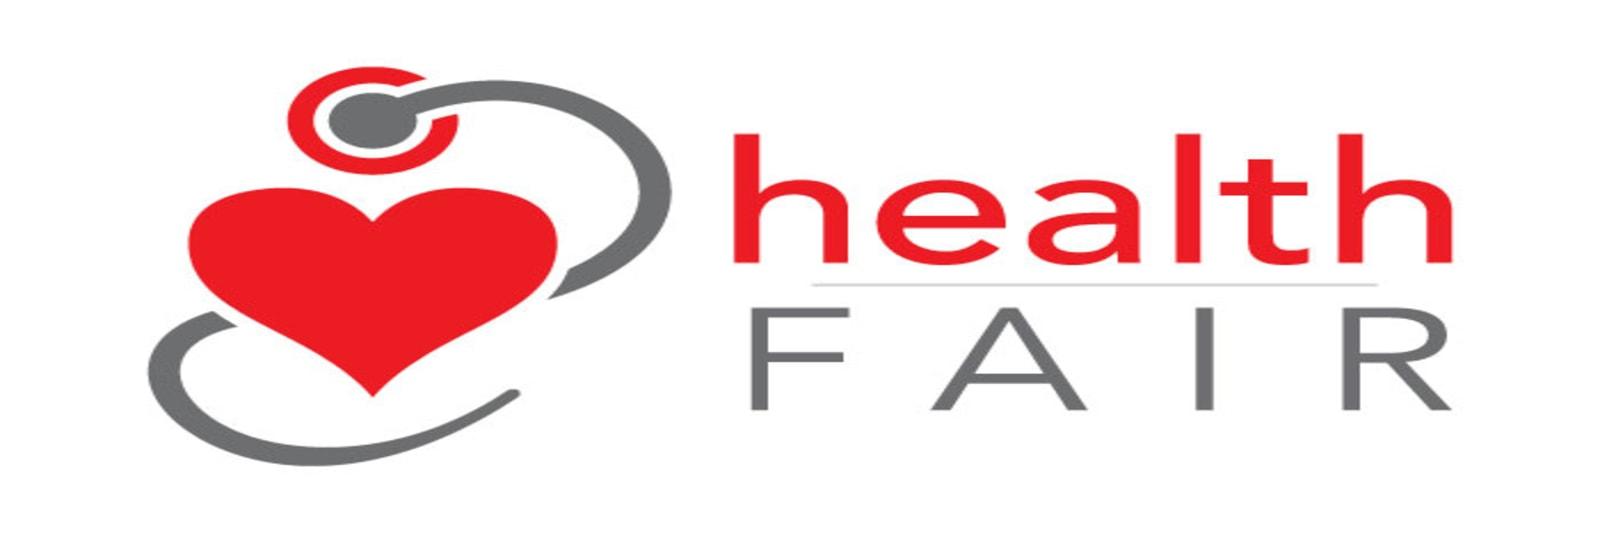 HealthFair-logo-w1600.jpg